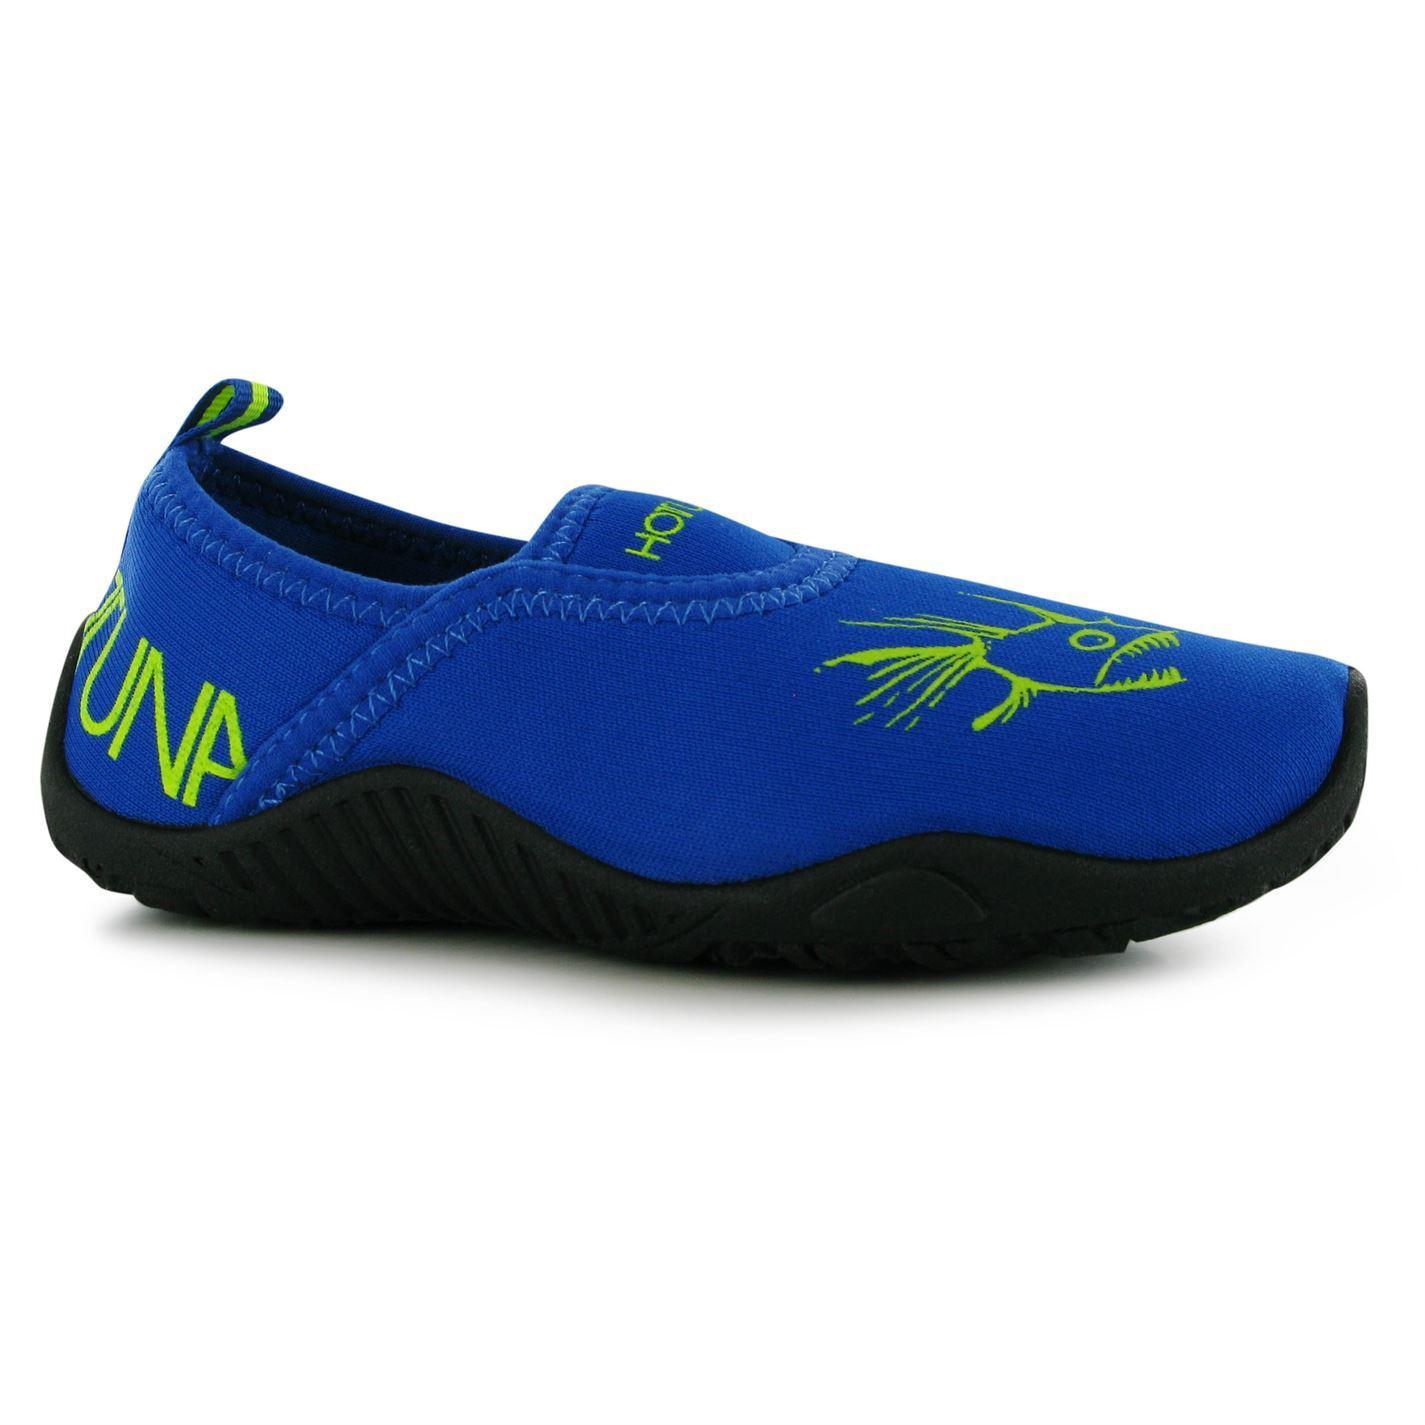 tuna splasher shoes slip on pull tab water sports